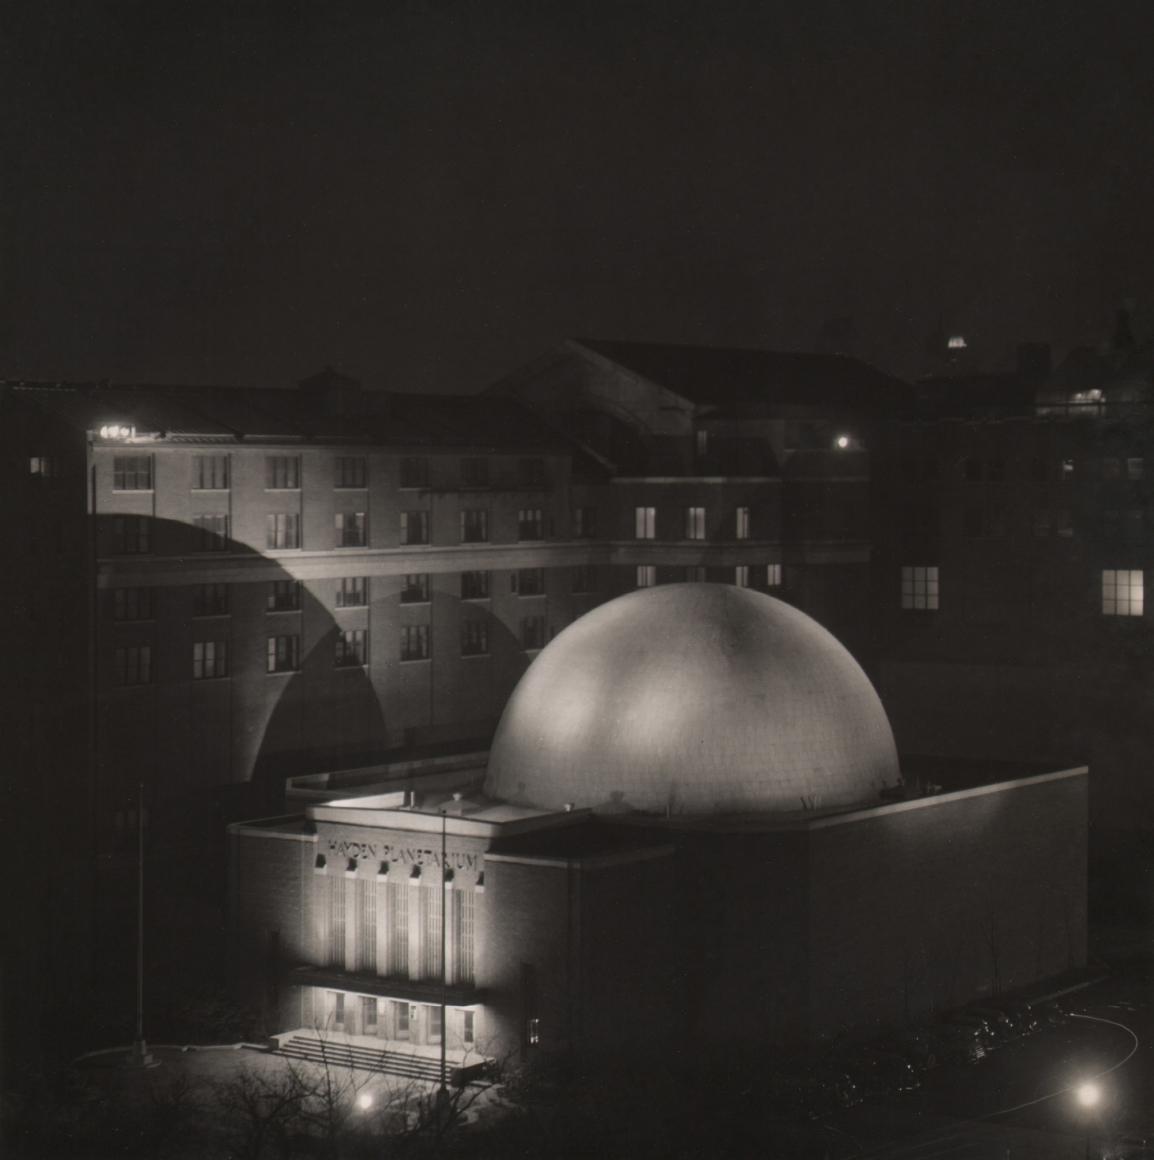 Paul J. Woolf, Hayden Planetarium, c. 1935. Night time view of domed planetarium building.